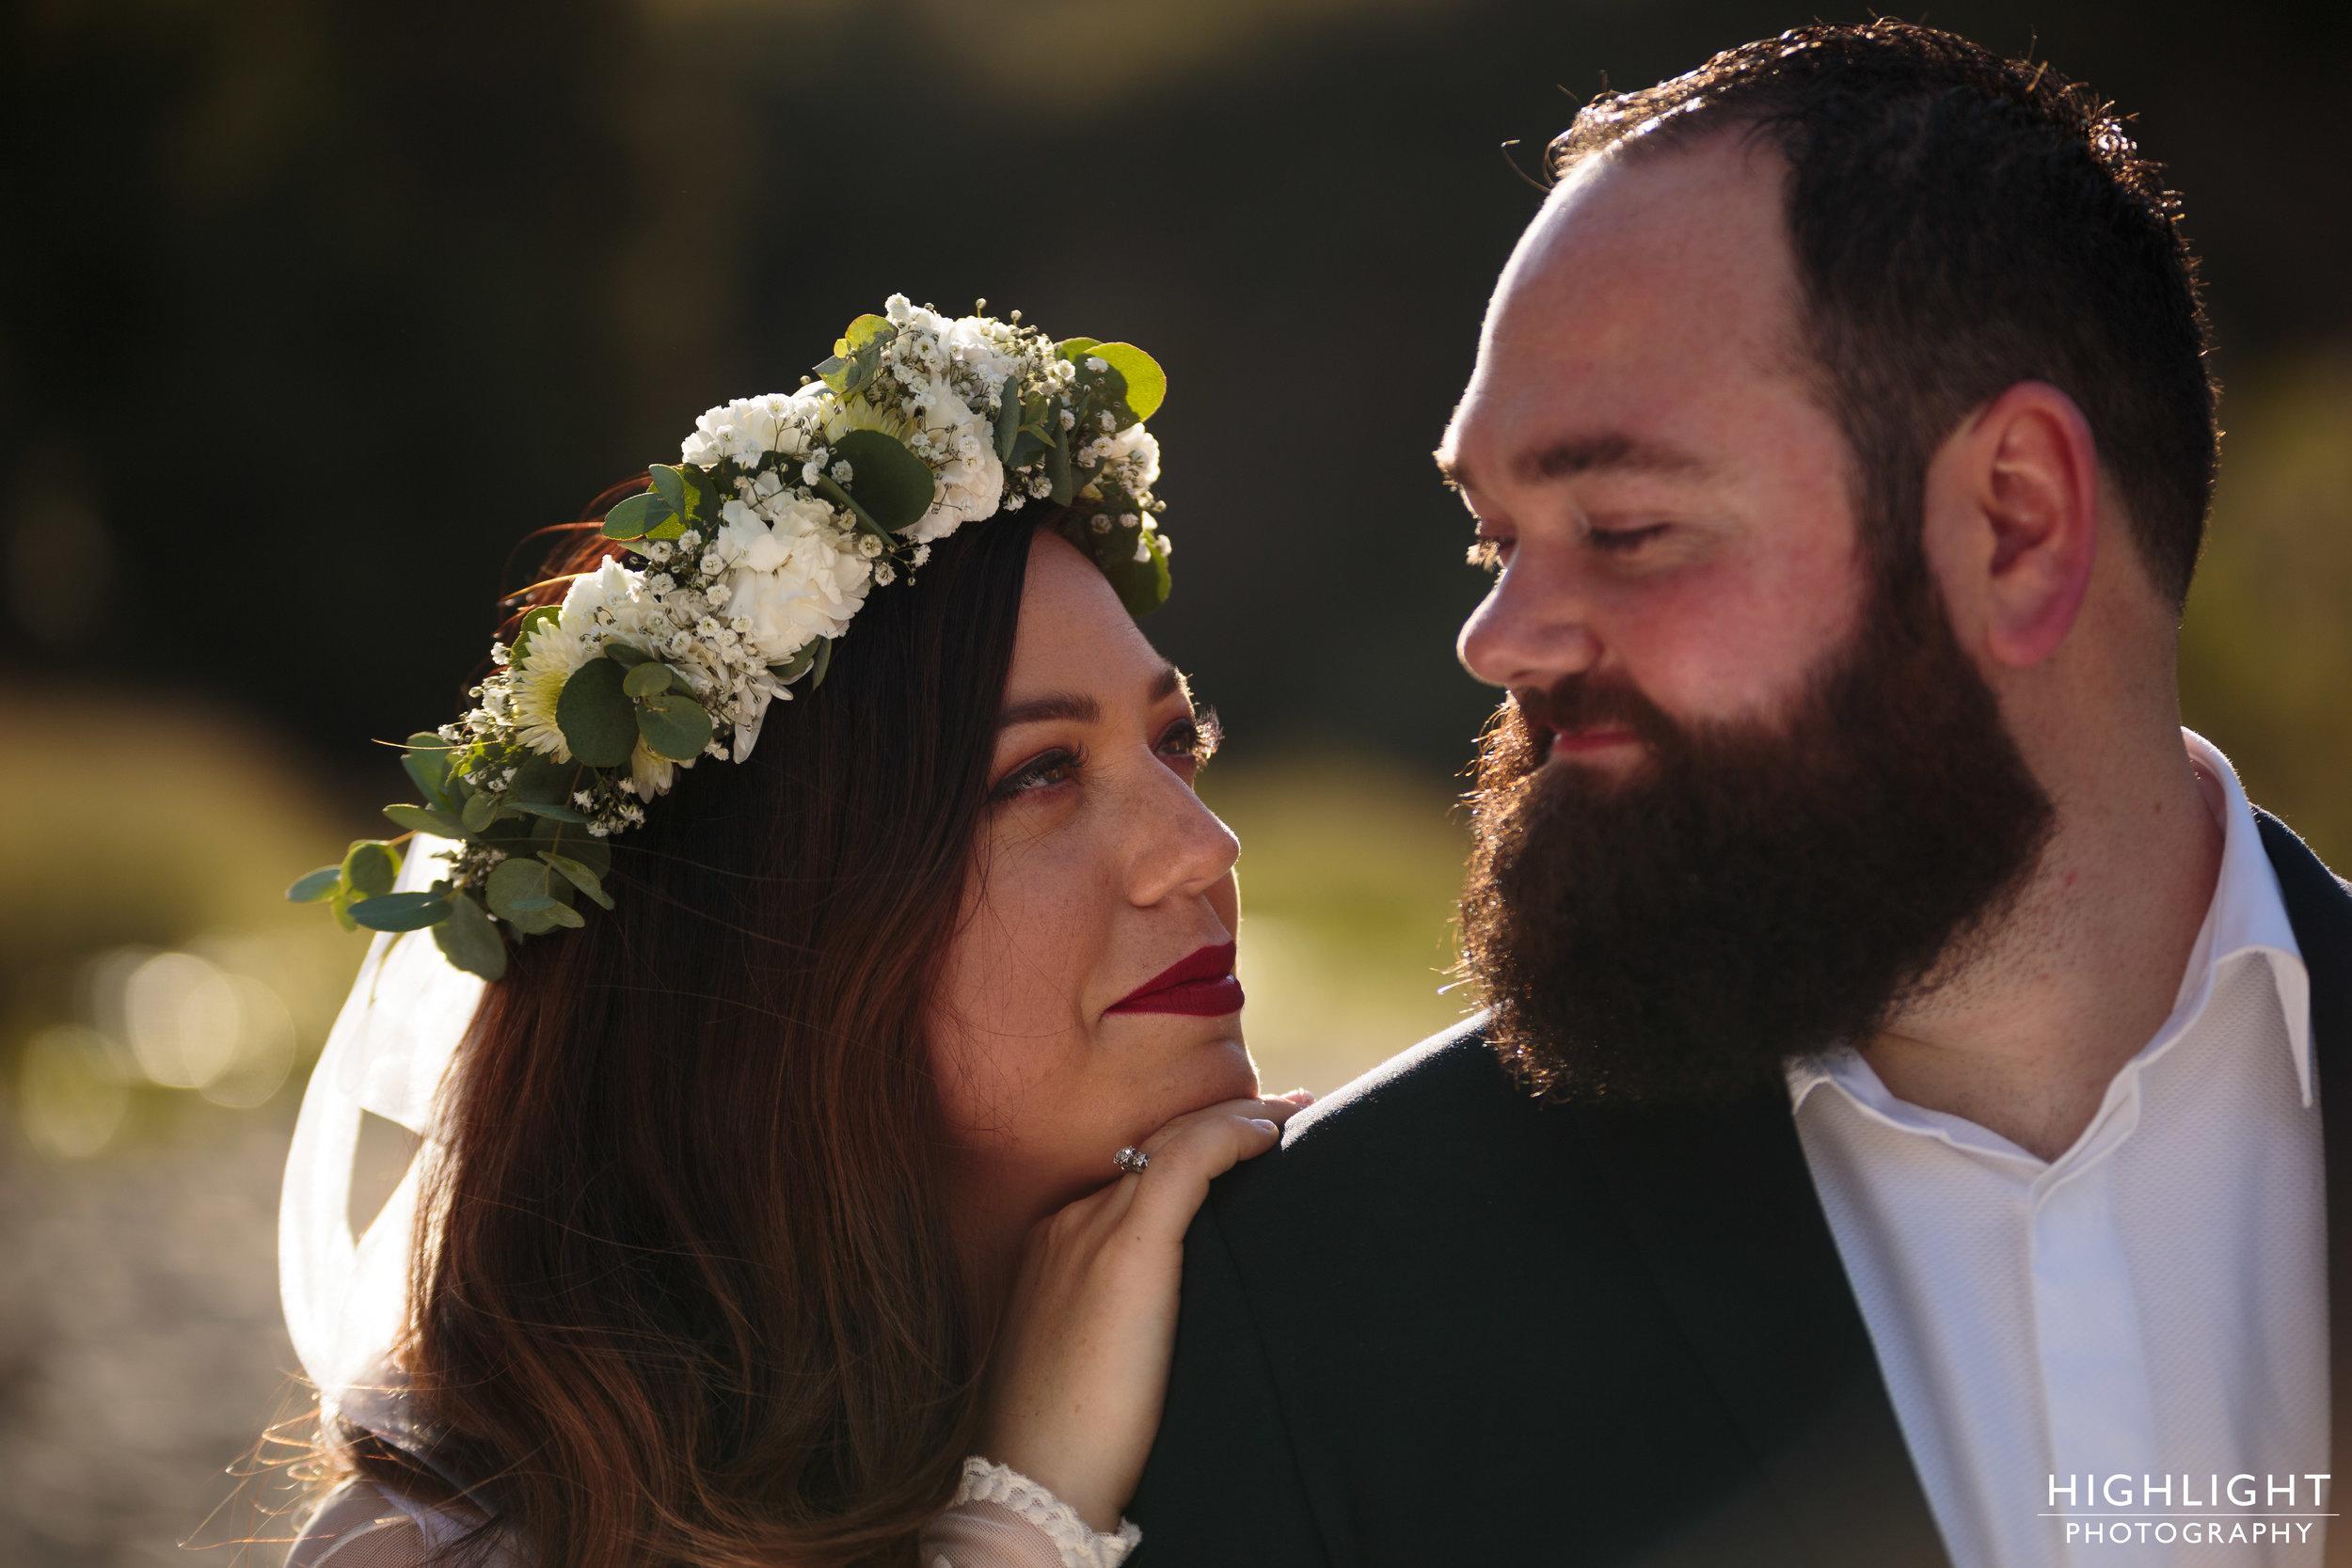 highlight-wedding-photography-new-zealand-makoura-lodge-wedding-136.jpg